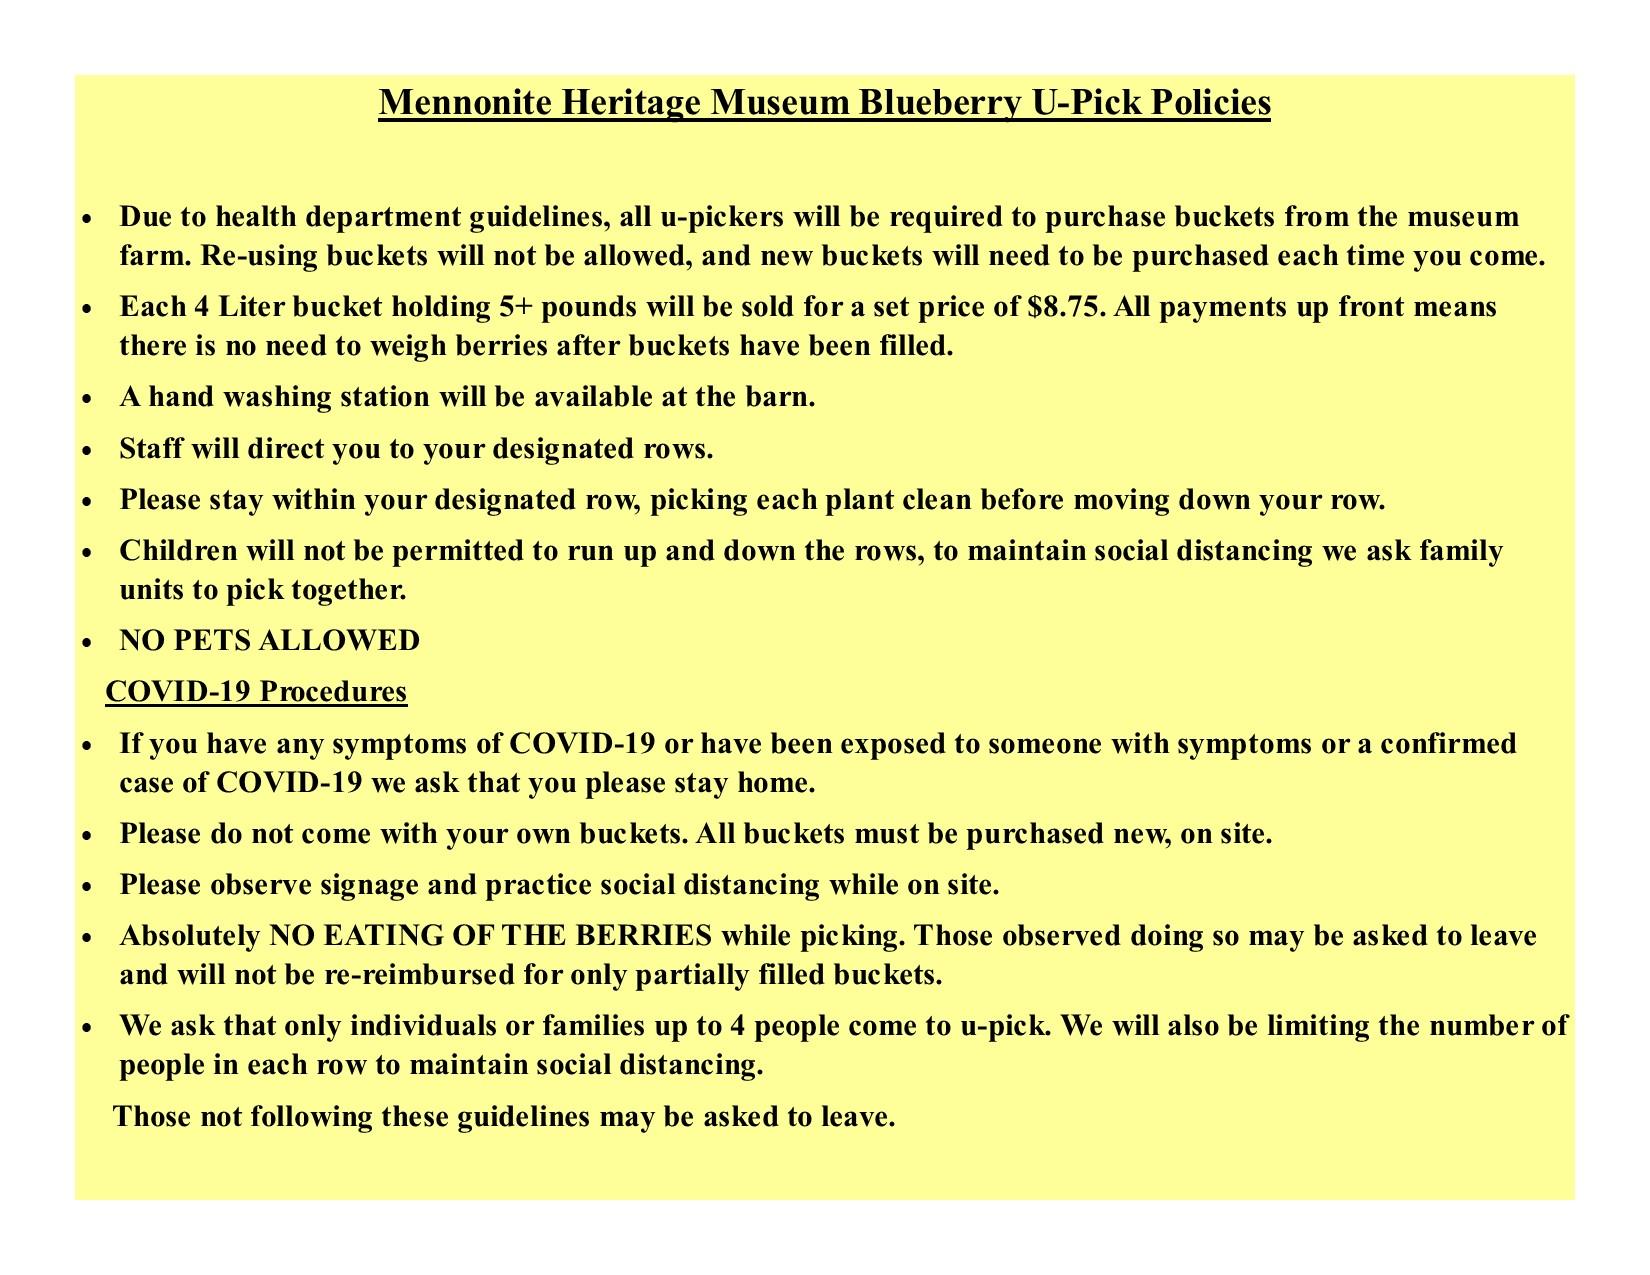 u-pick blueberry policies 2020